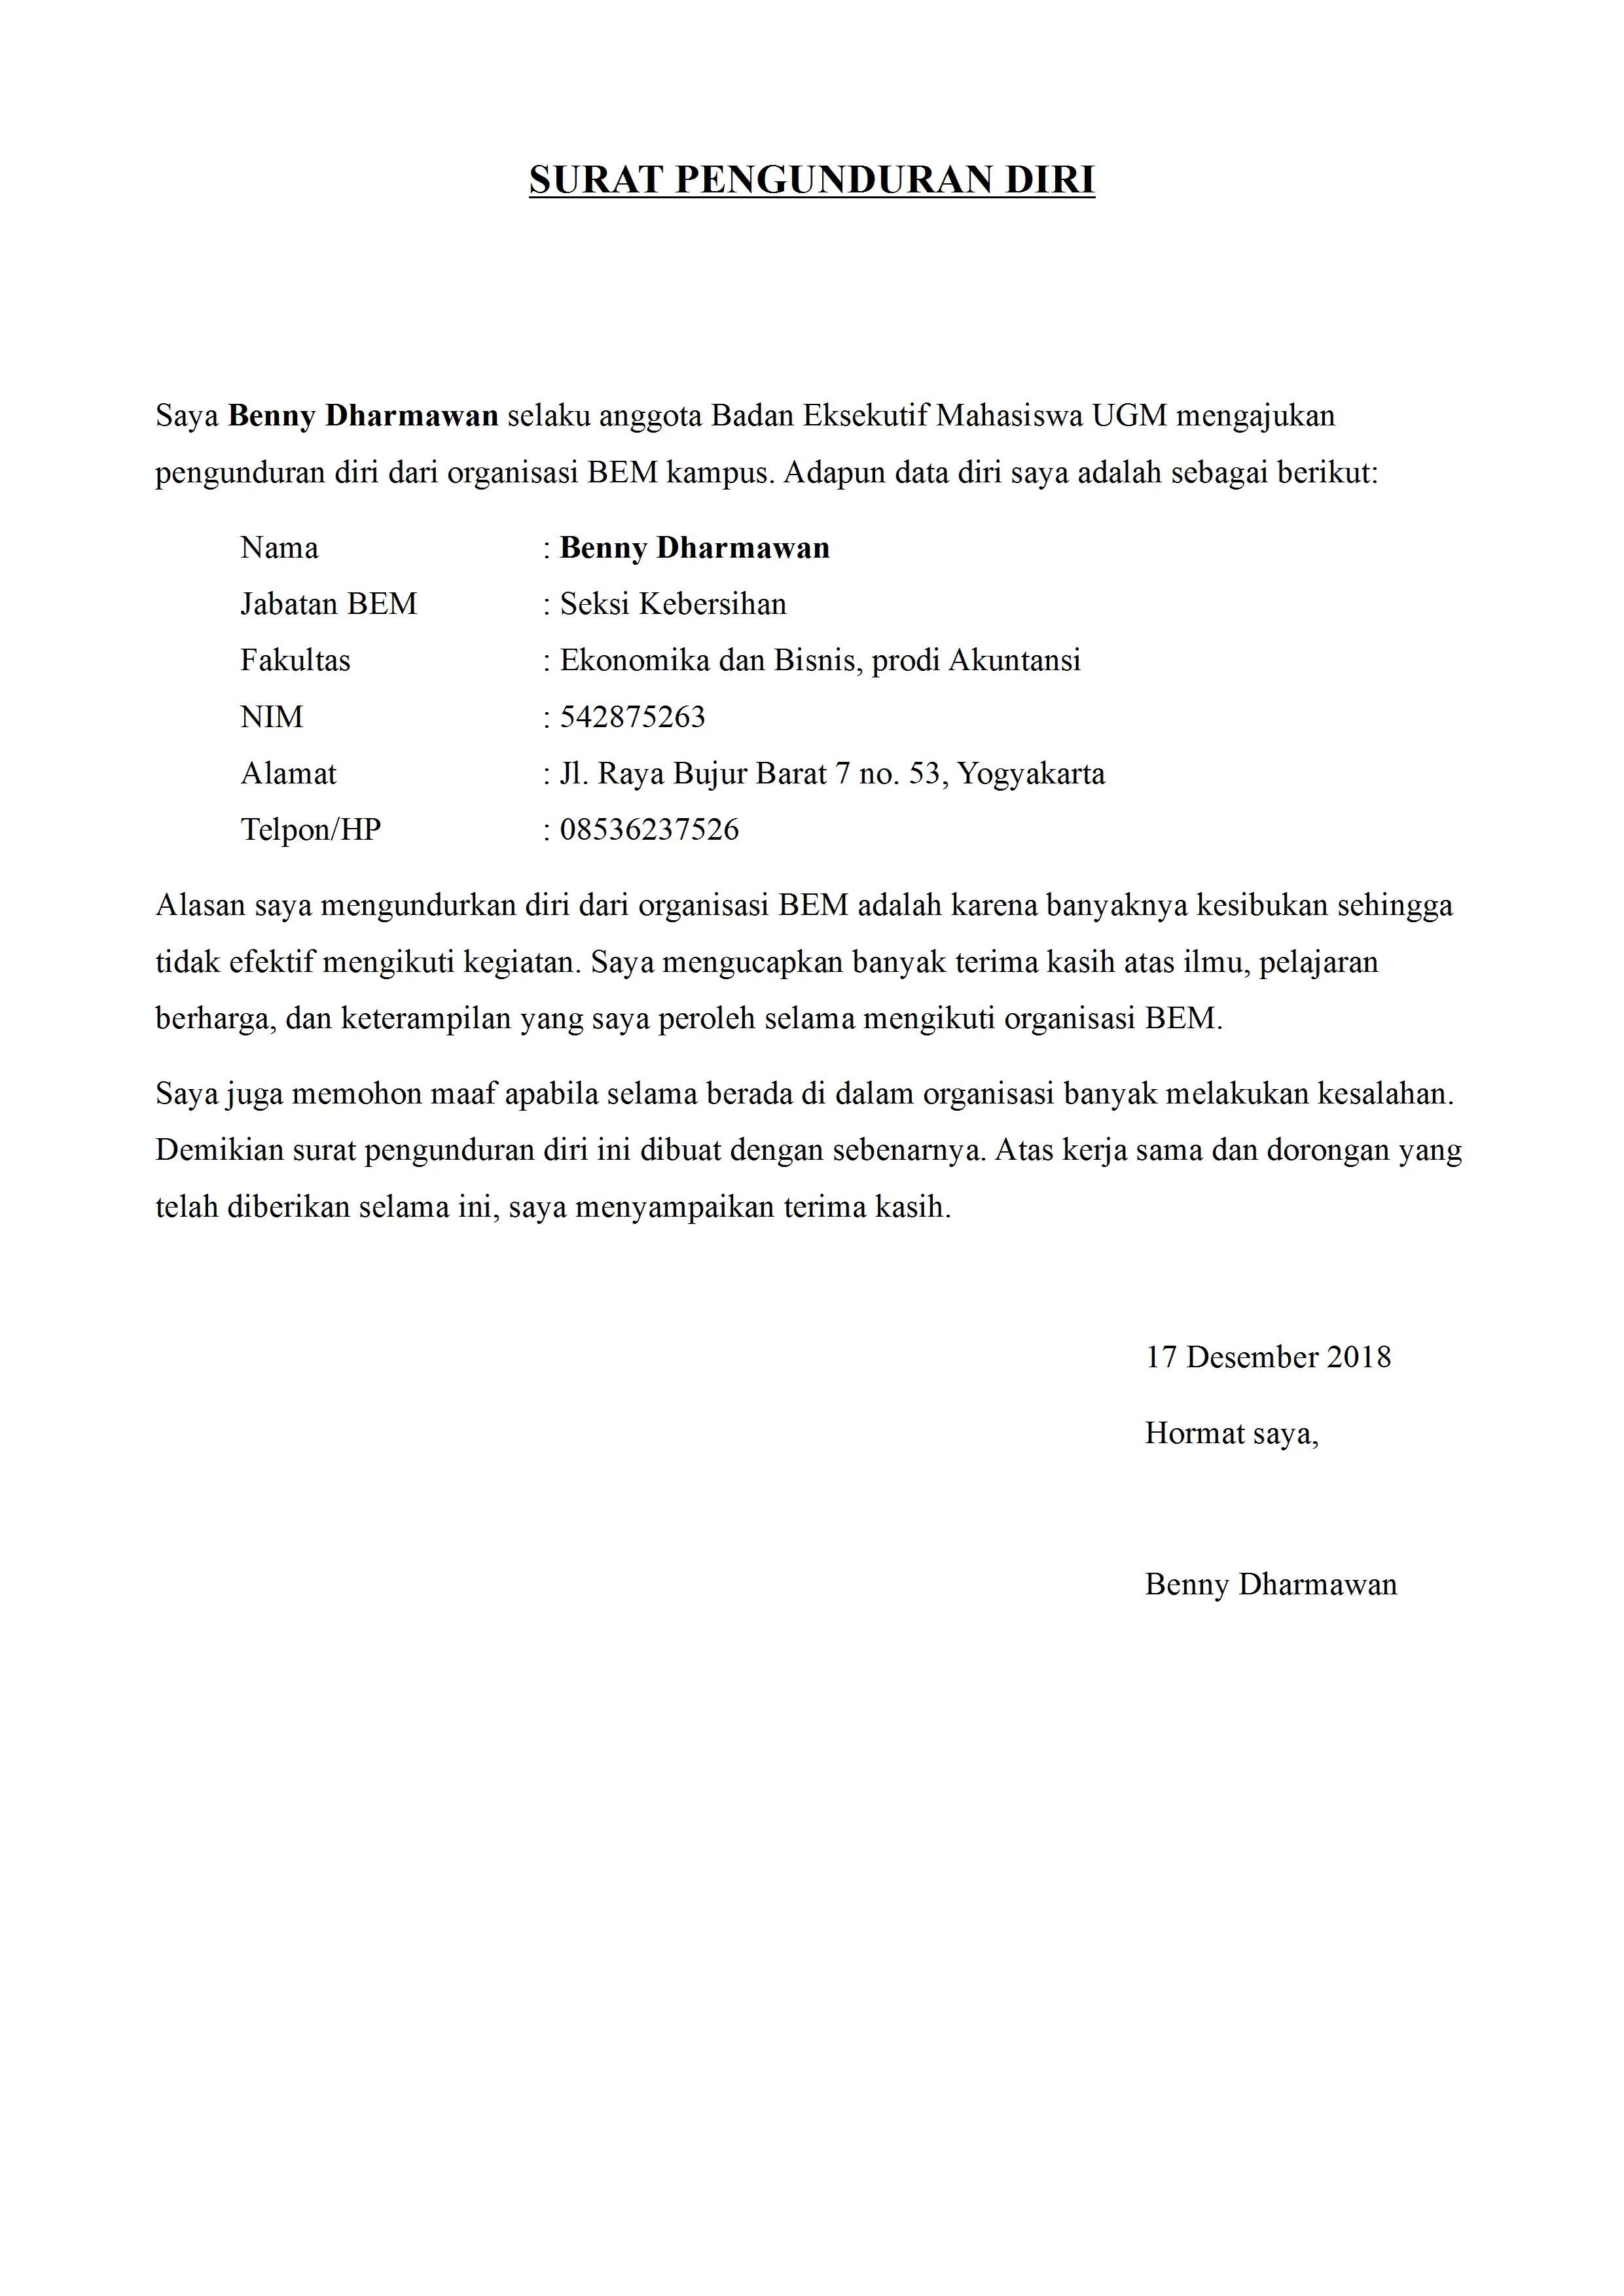 Contoh Surat Pernyataan Pengunduran Diri Dari Organisasi